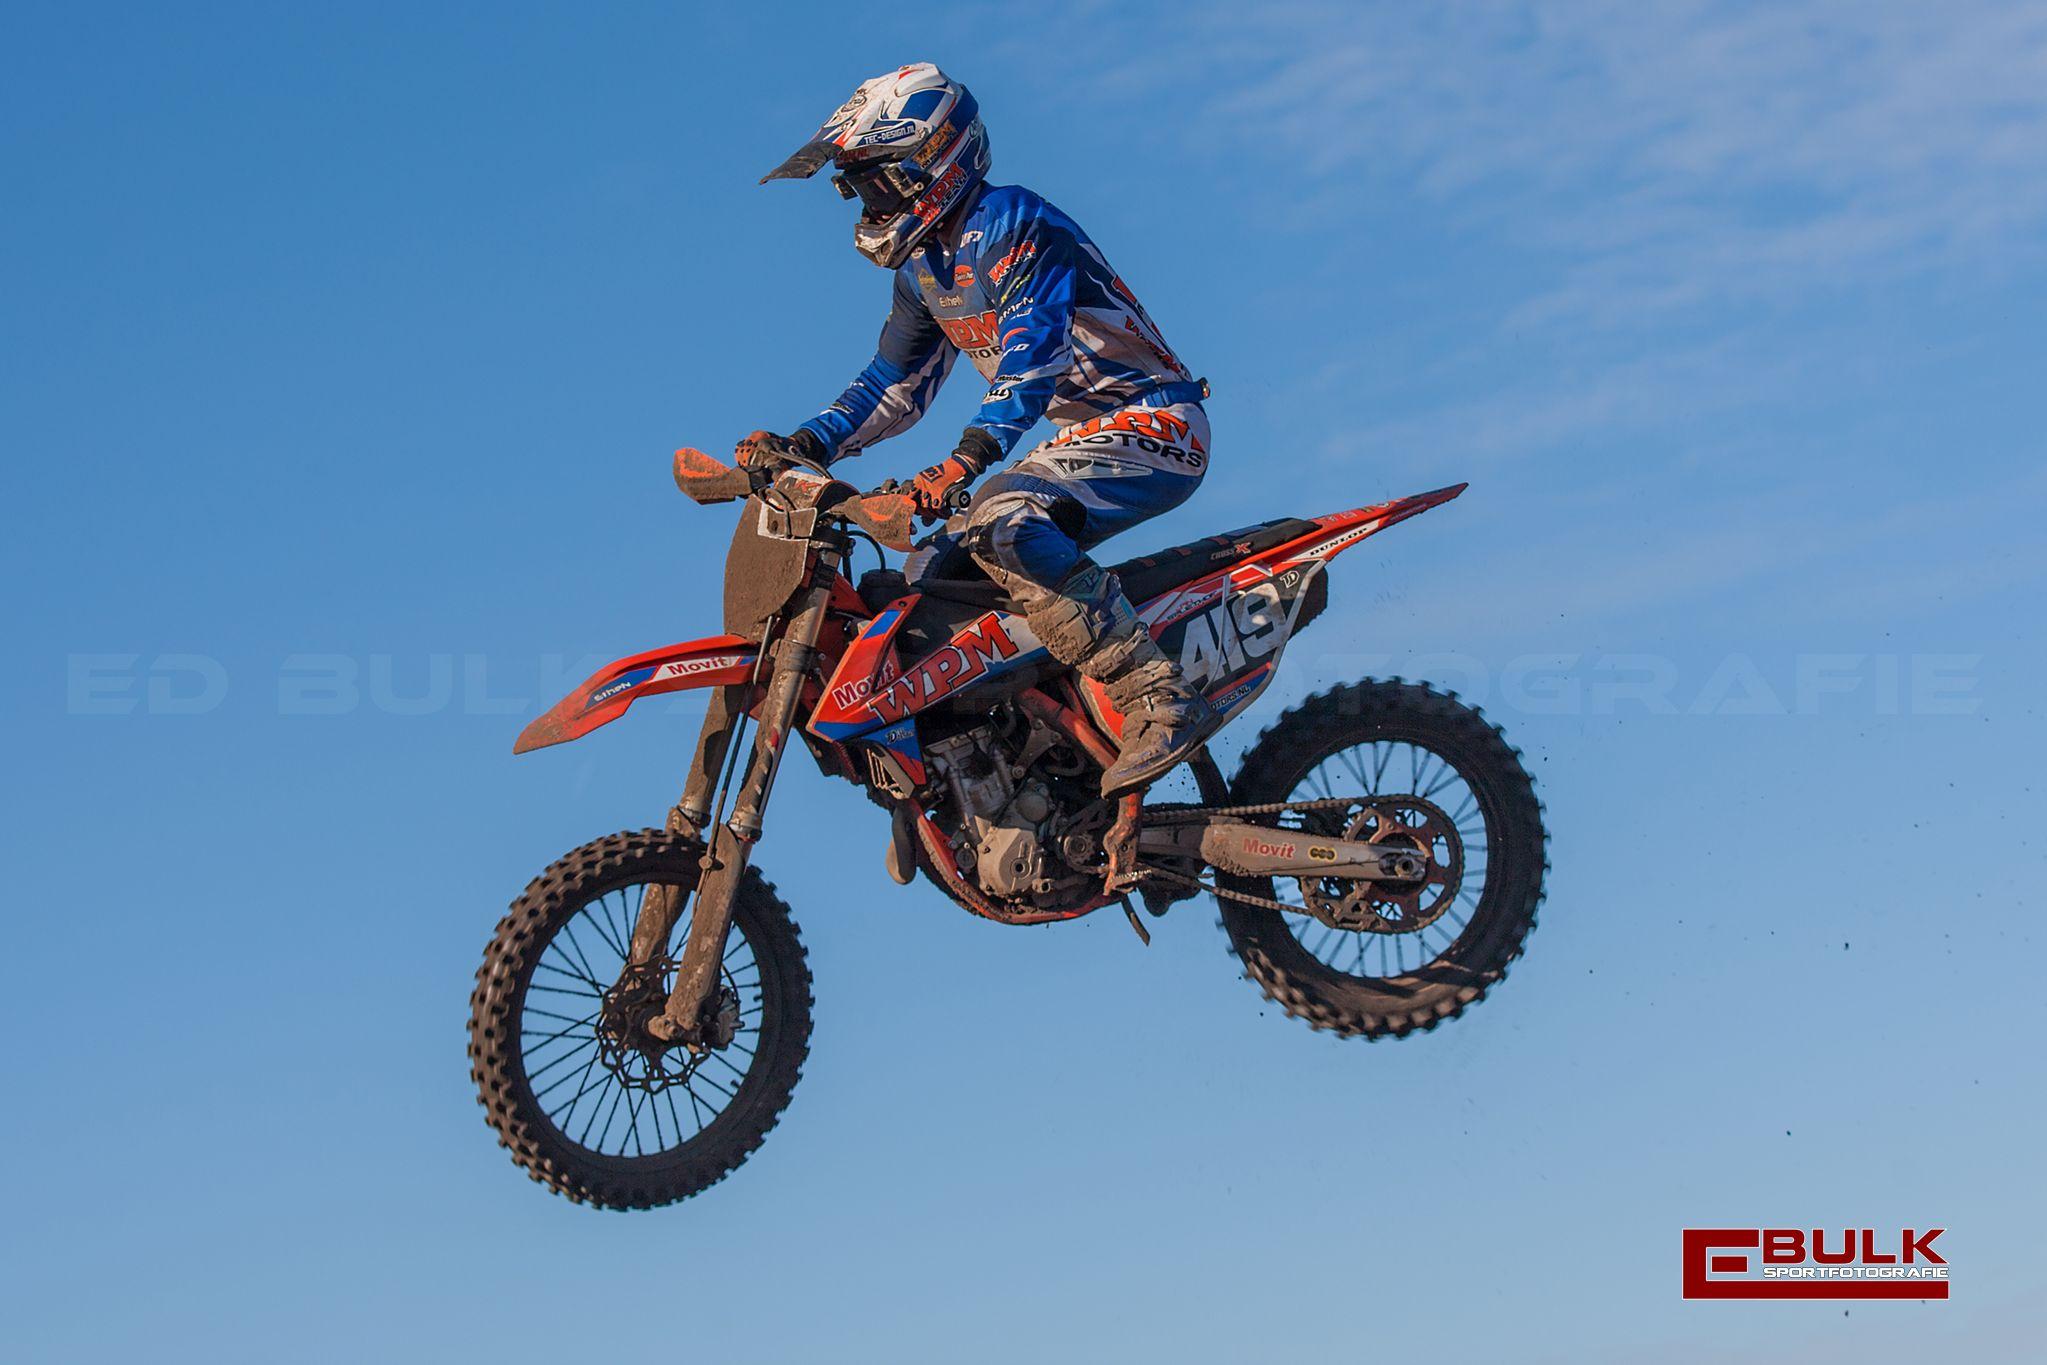 ebs_0974-ed_bulk_sportfotografie